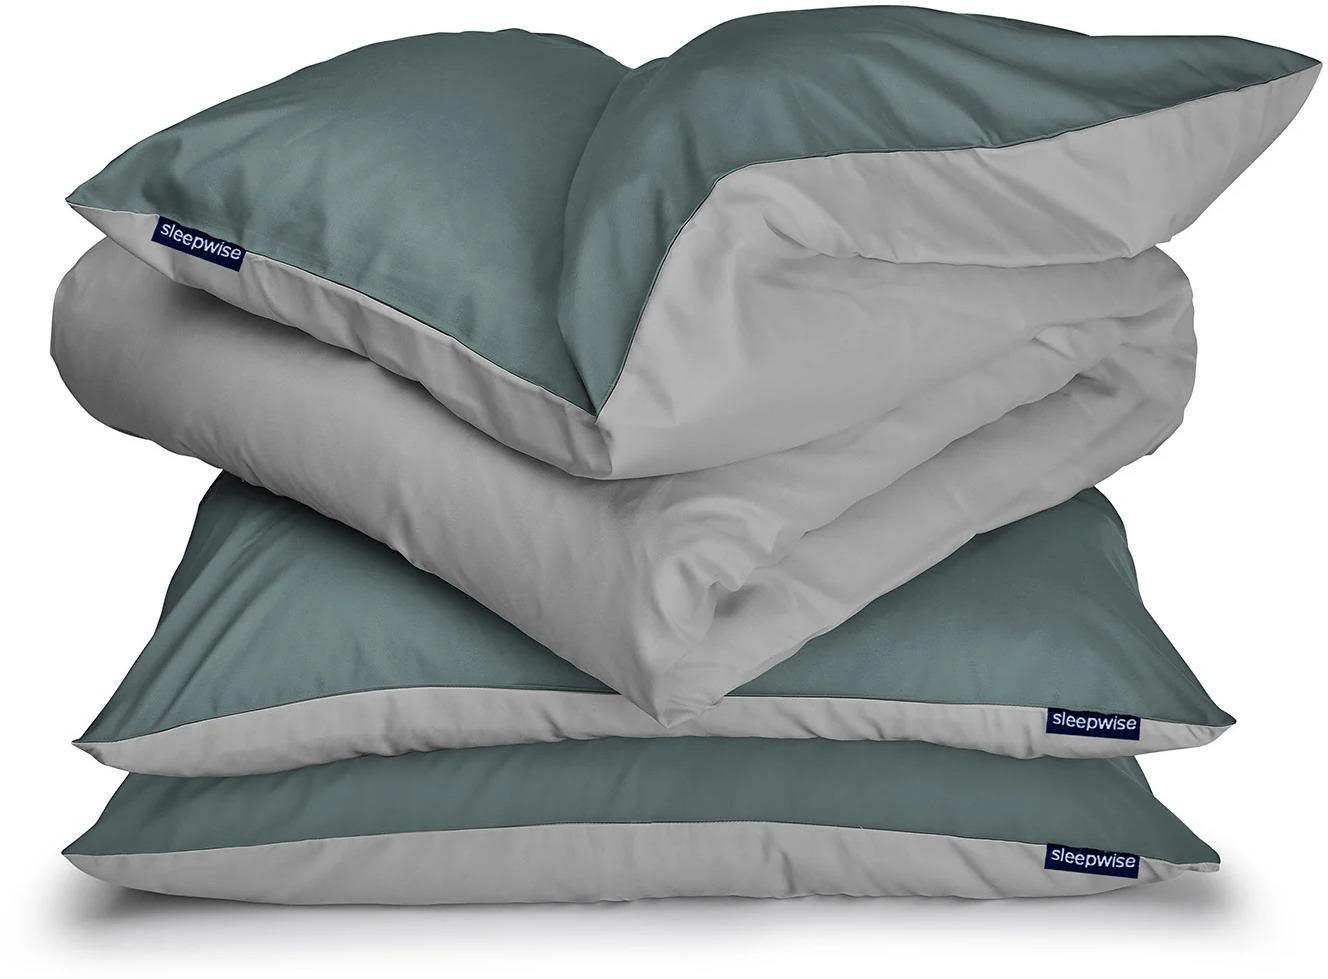 Sleepwise Soft Wonder-Edition, posteľná bielizeň, zelenosivá/svetlosivá, 200 × 200 cm, 80 x 80 cm